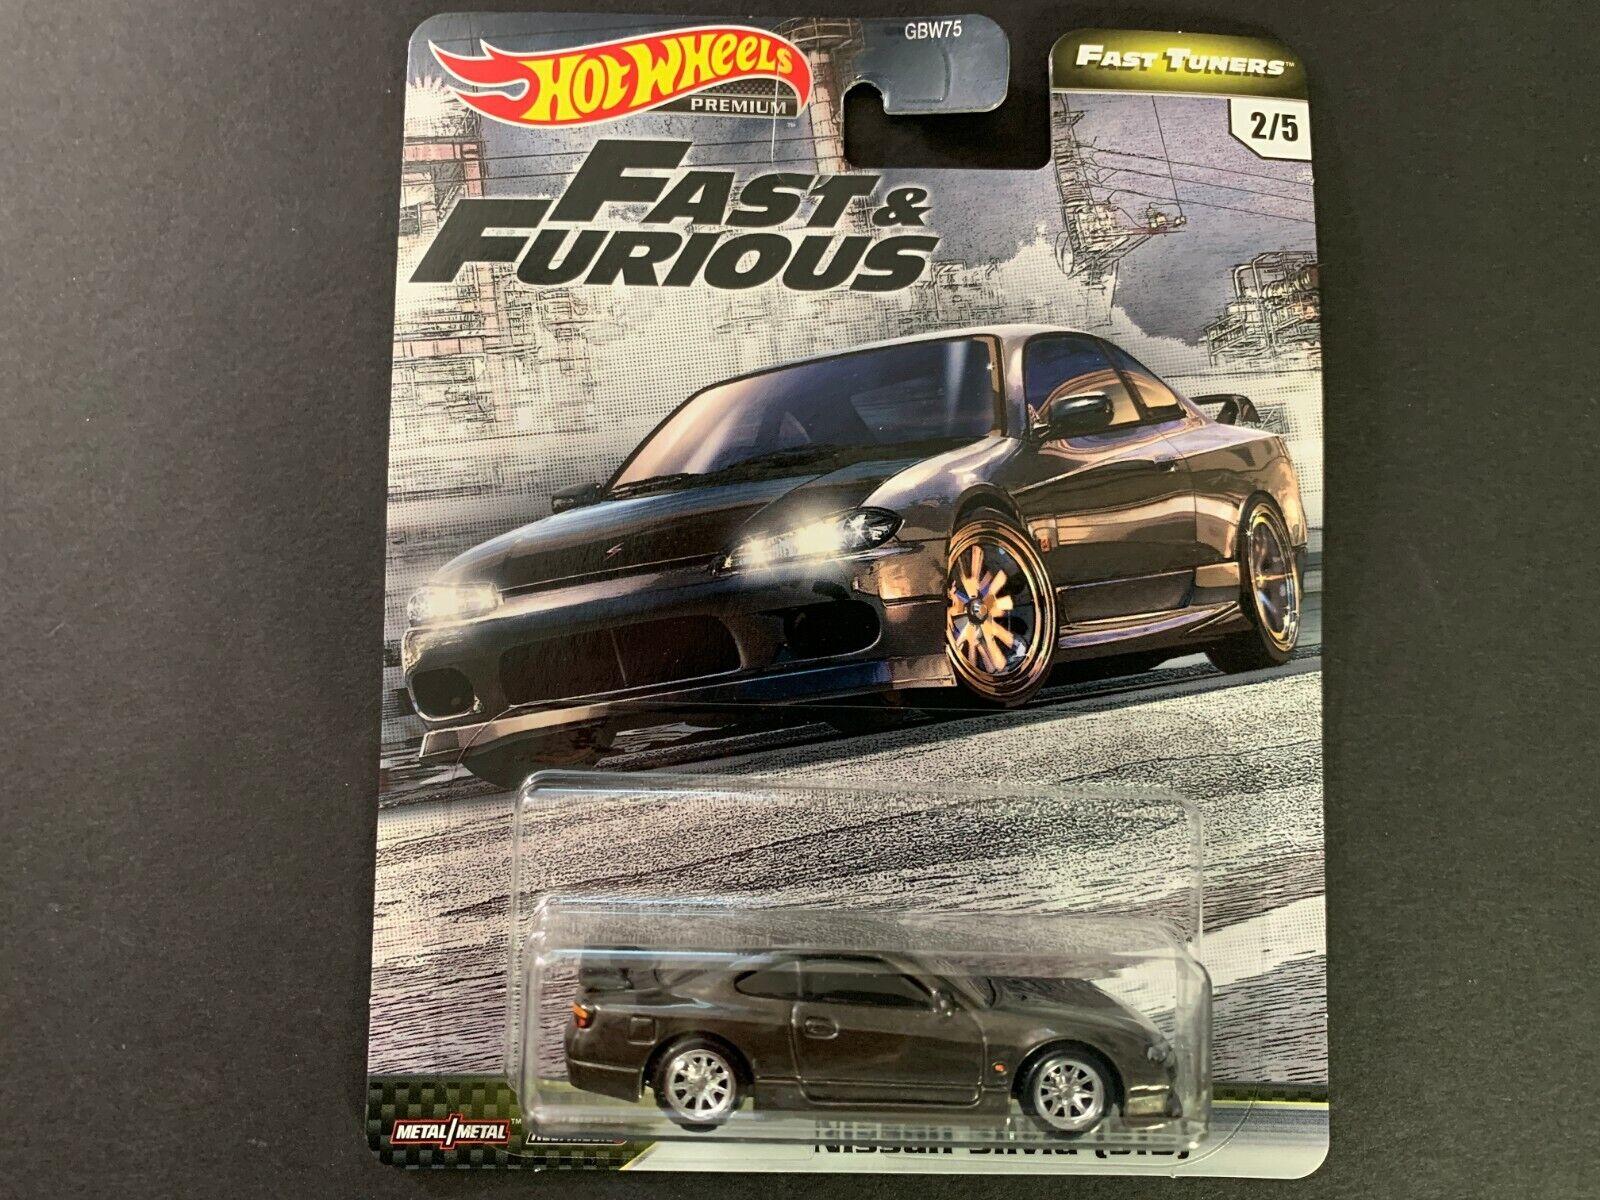 Hot Wheels GBW75-19 Nissan Silvia lila//orange Fast /& Furious 1:64 NEU!°